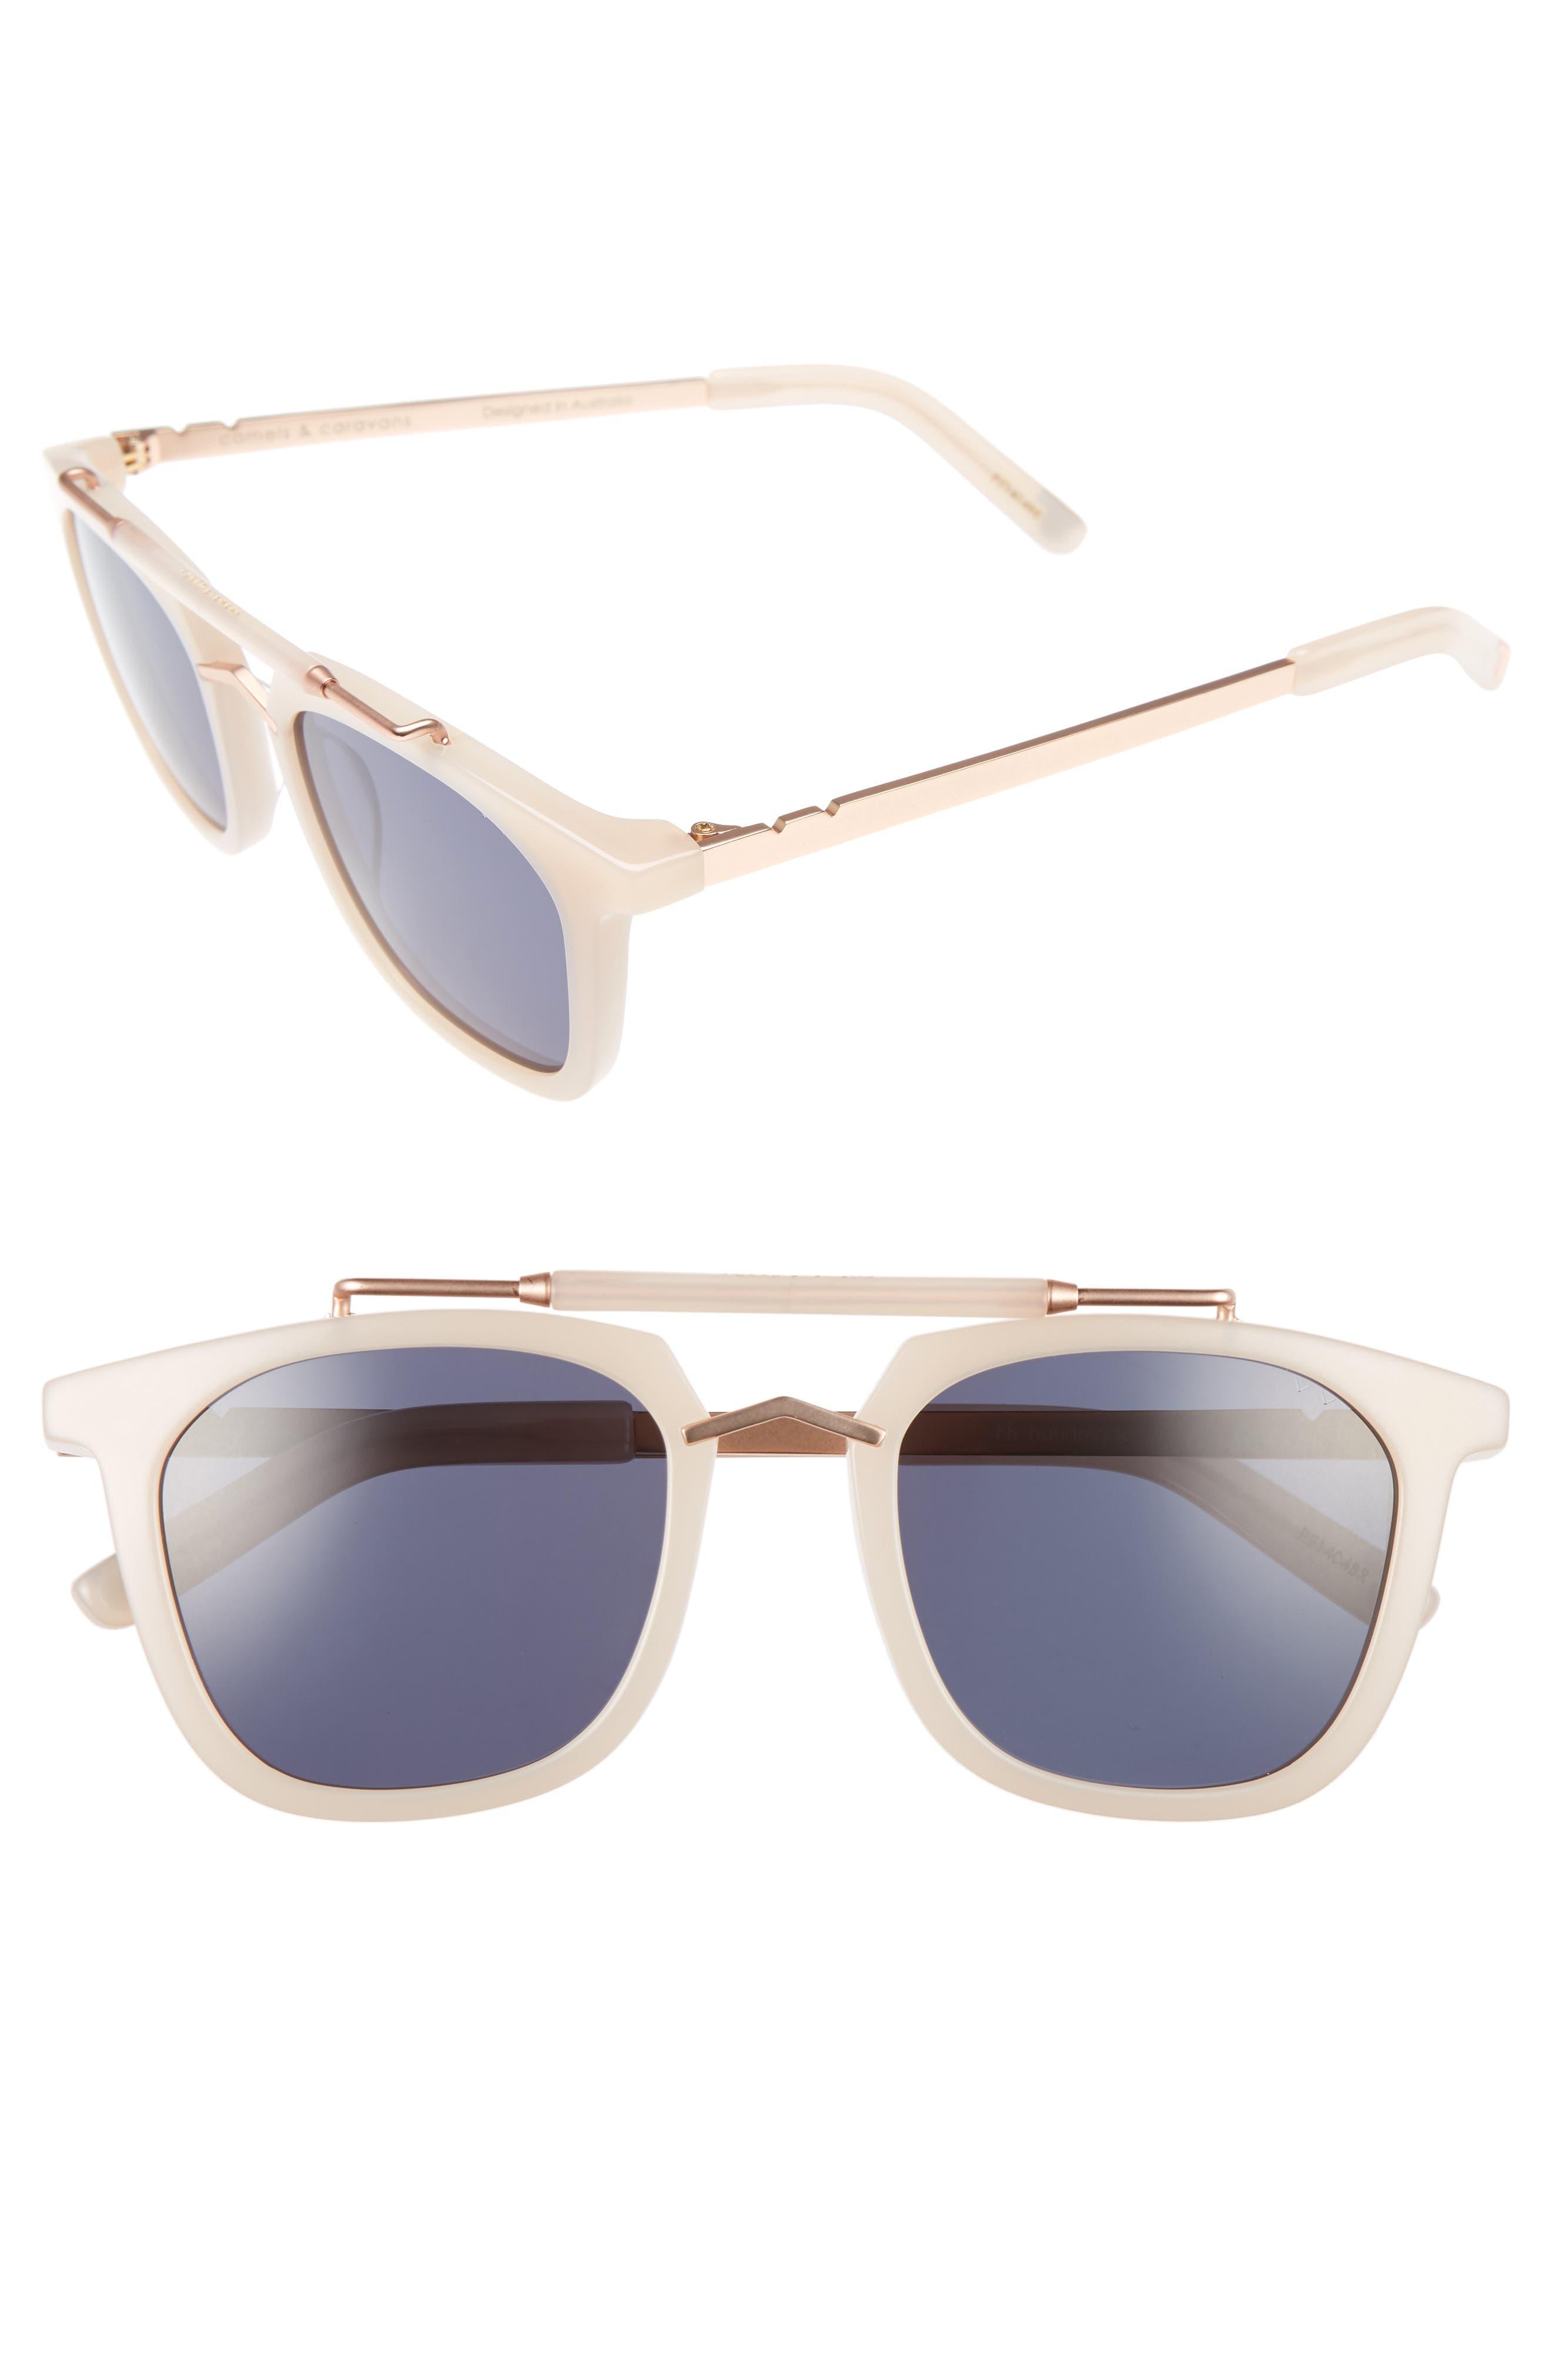 Camels & Caravans 50mm Retro Sunglasses,                             Main thumbnail 1, color,                             Blush/ Rose Gold Grey